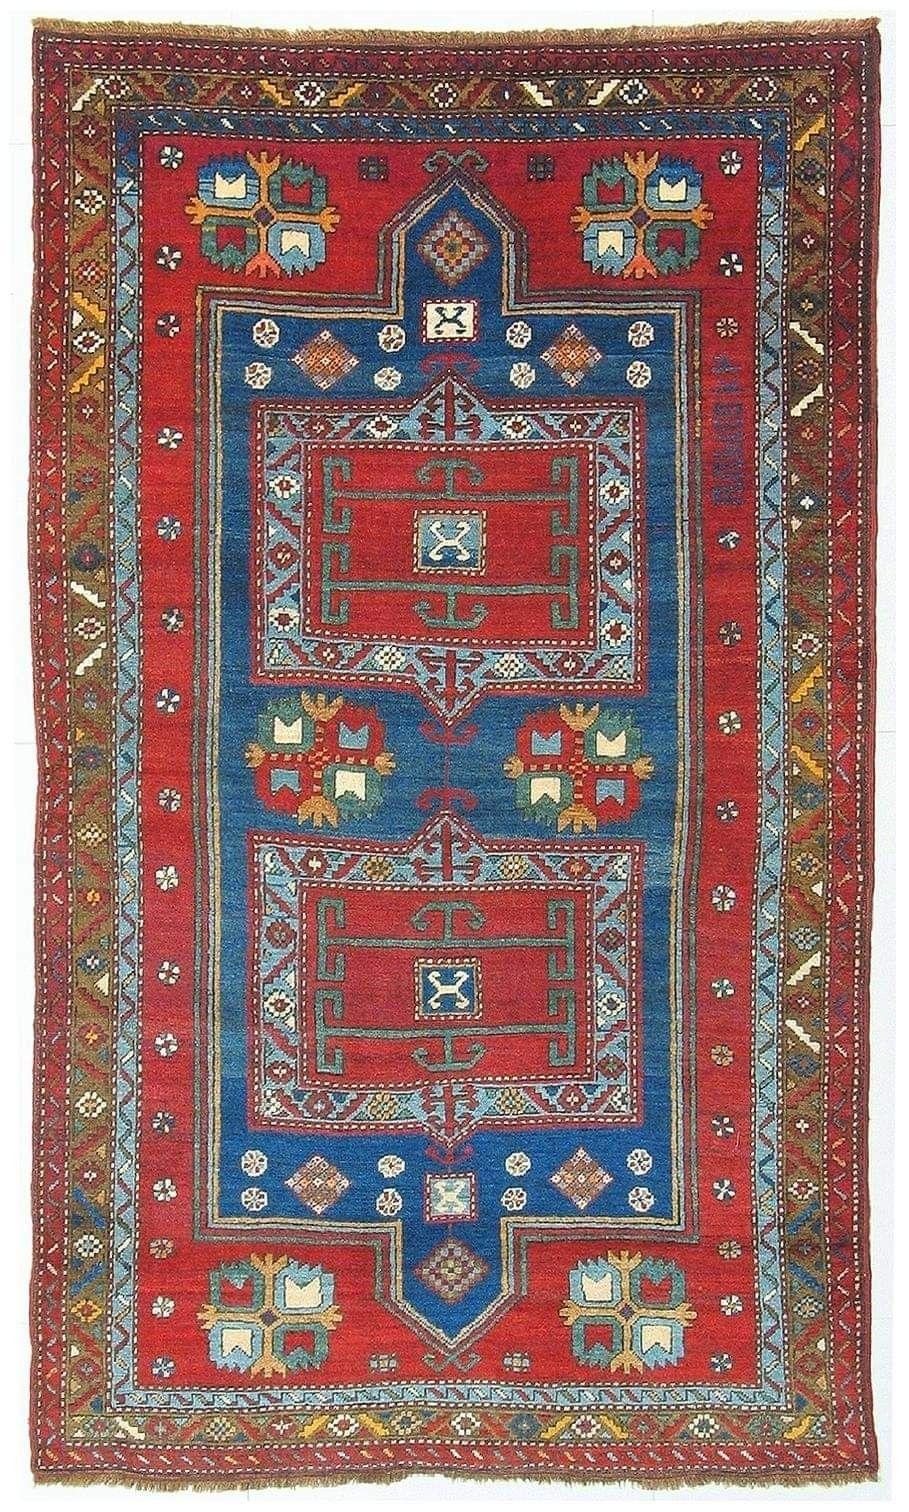 Sevan Kazak Tappeti e Persiane